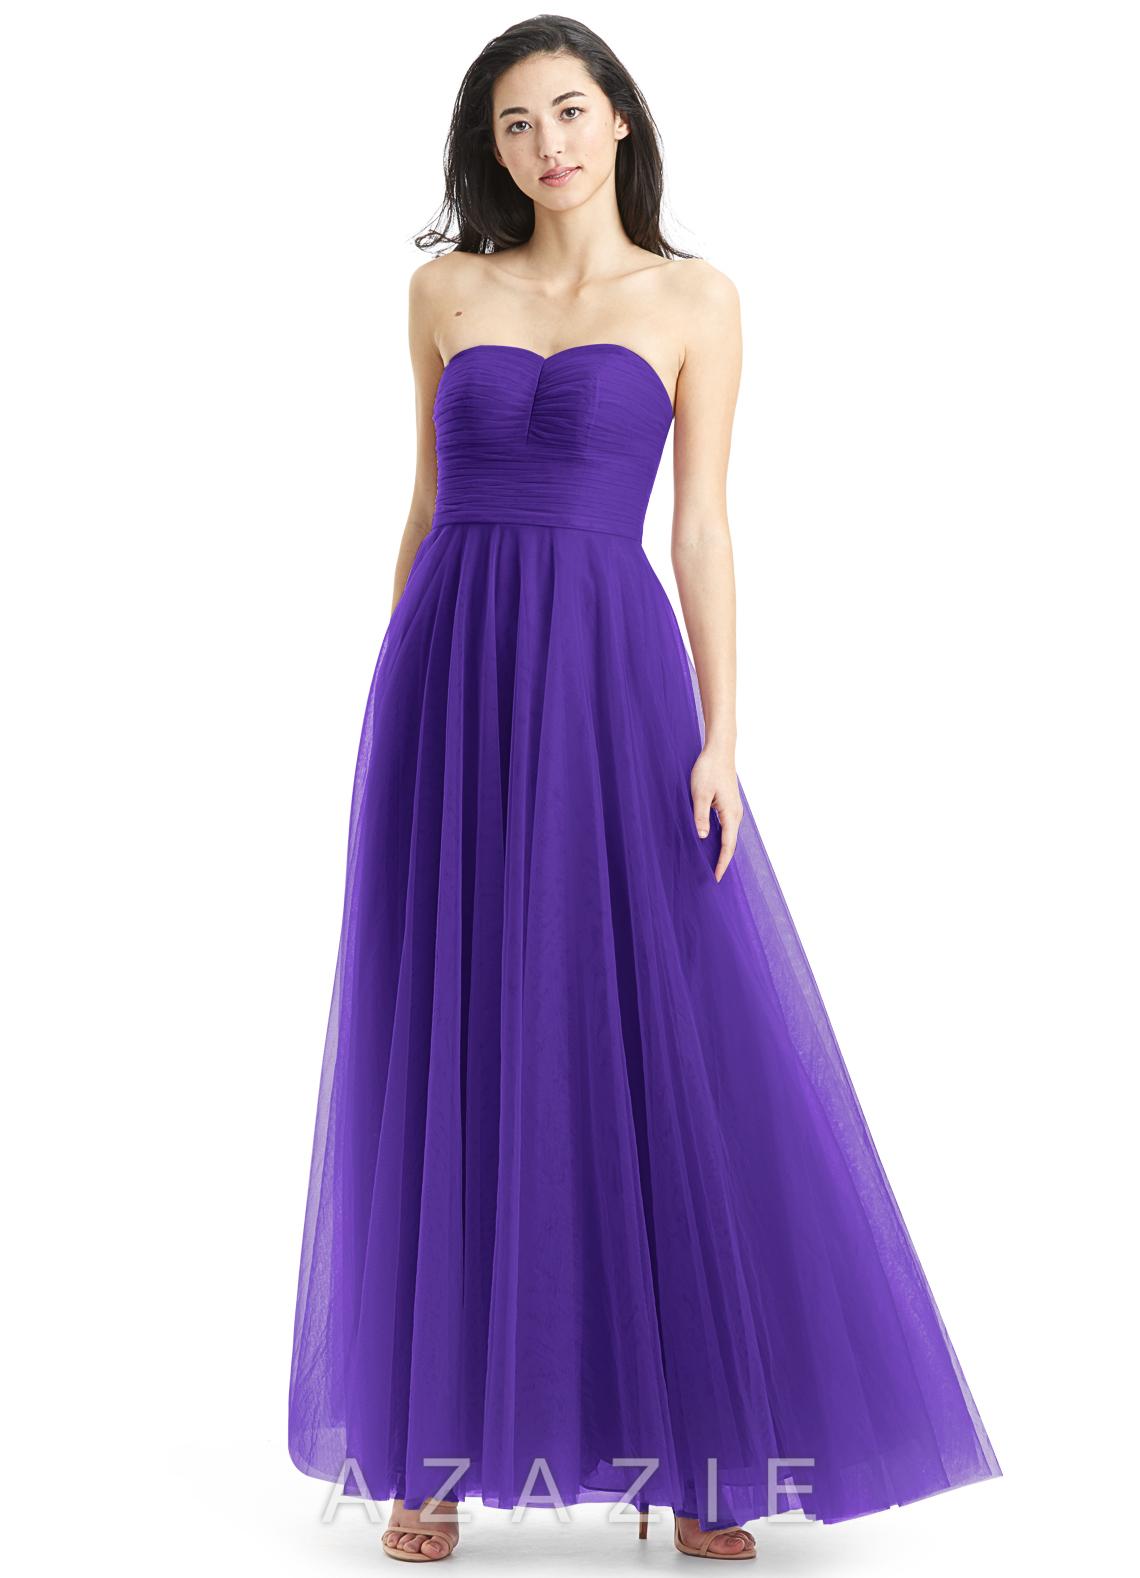 Azazie lola bridesmaid dress azazie color regency ombrellifo Images